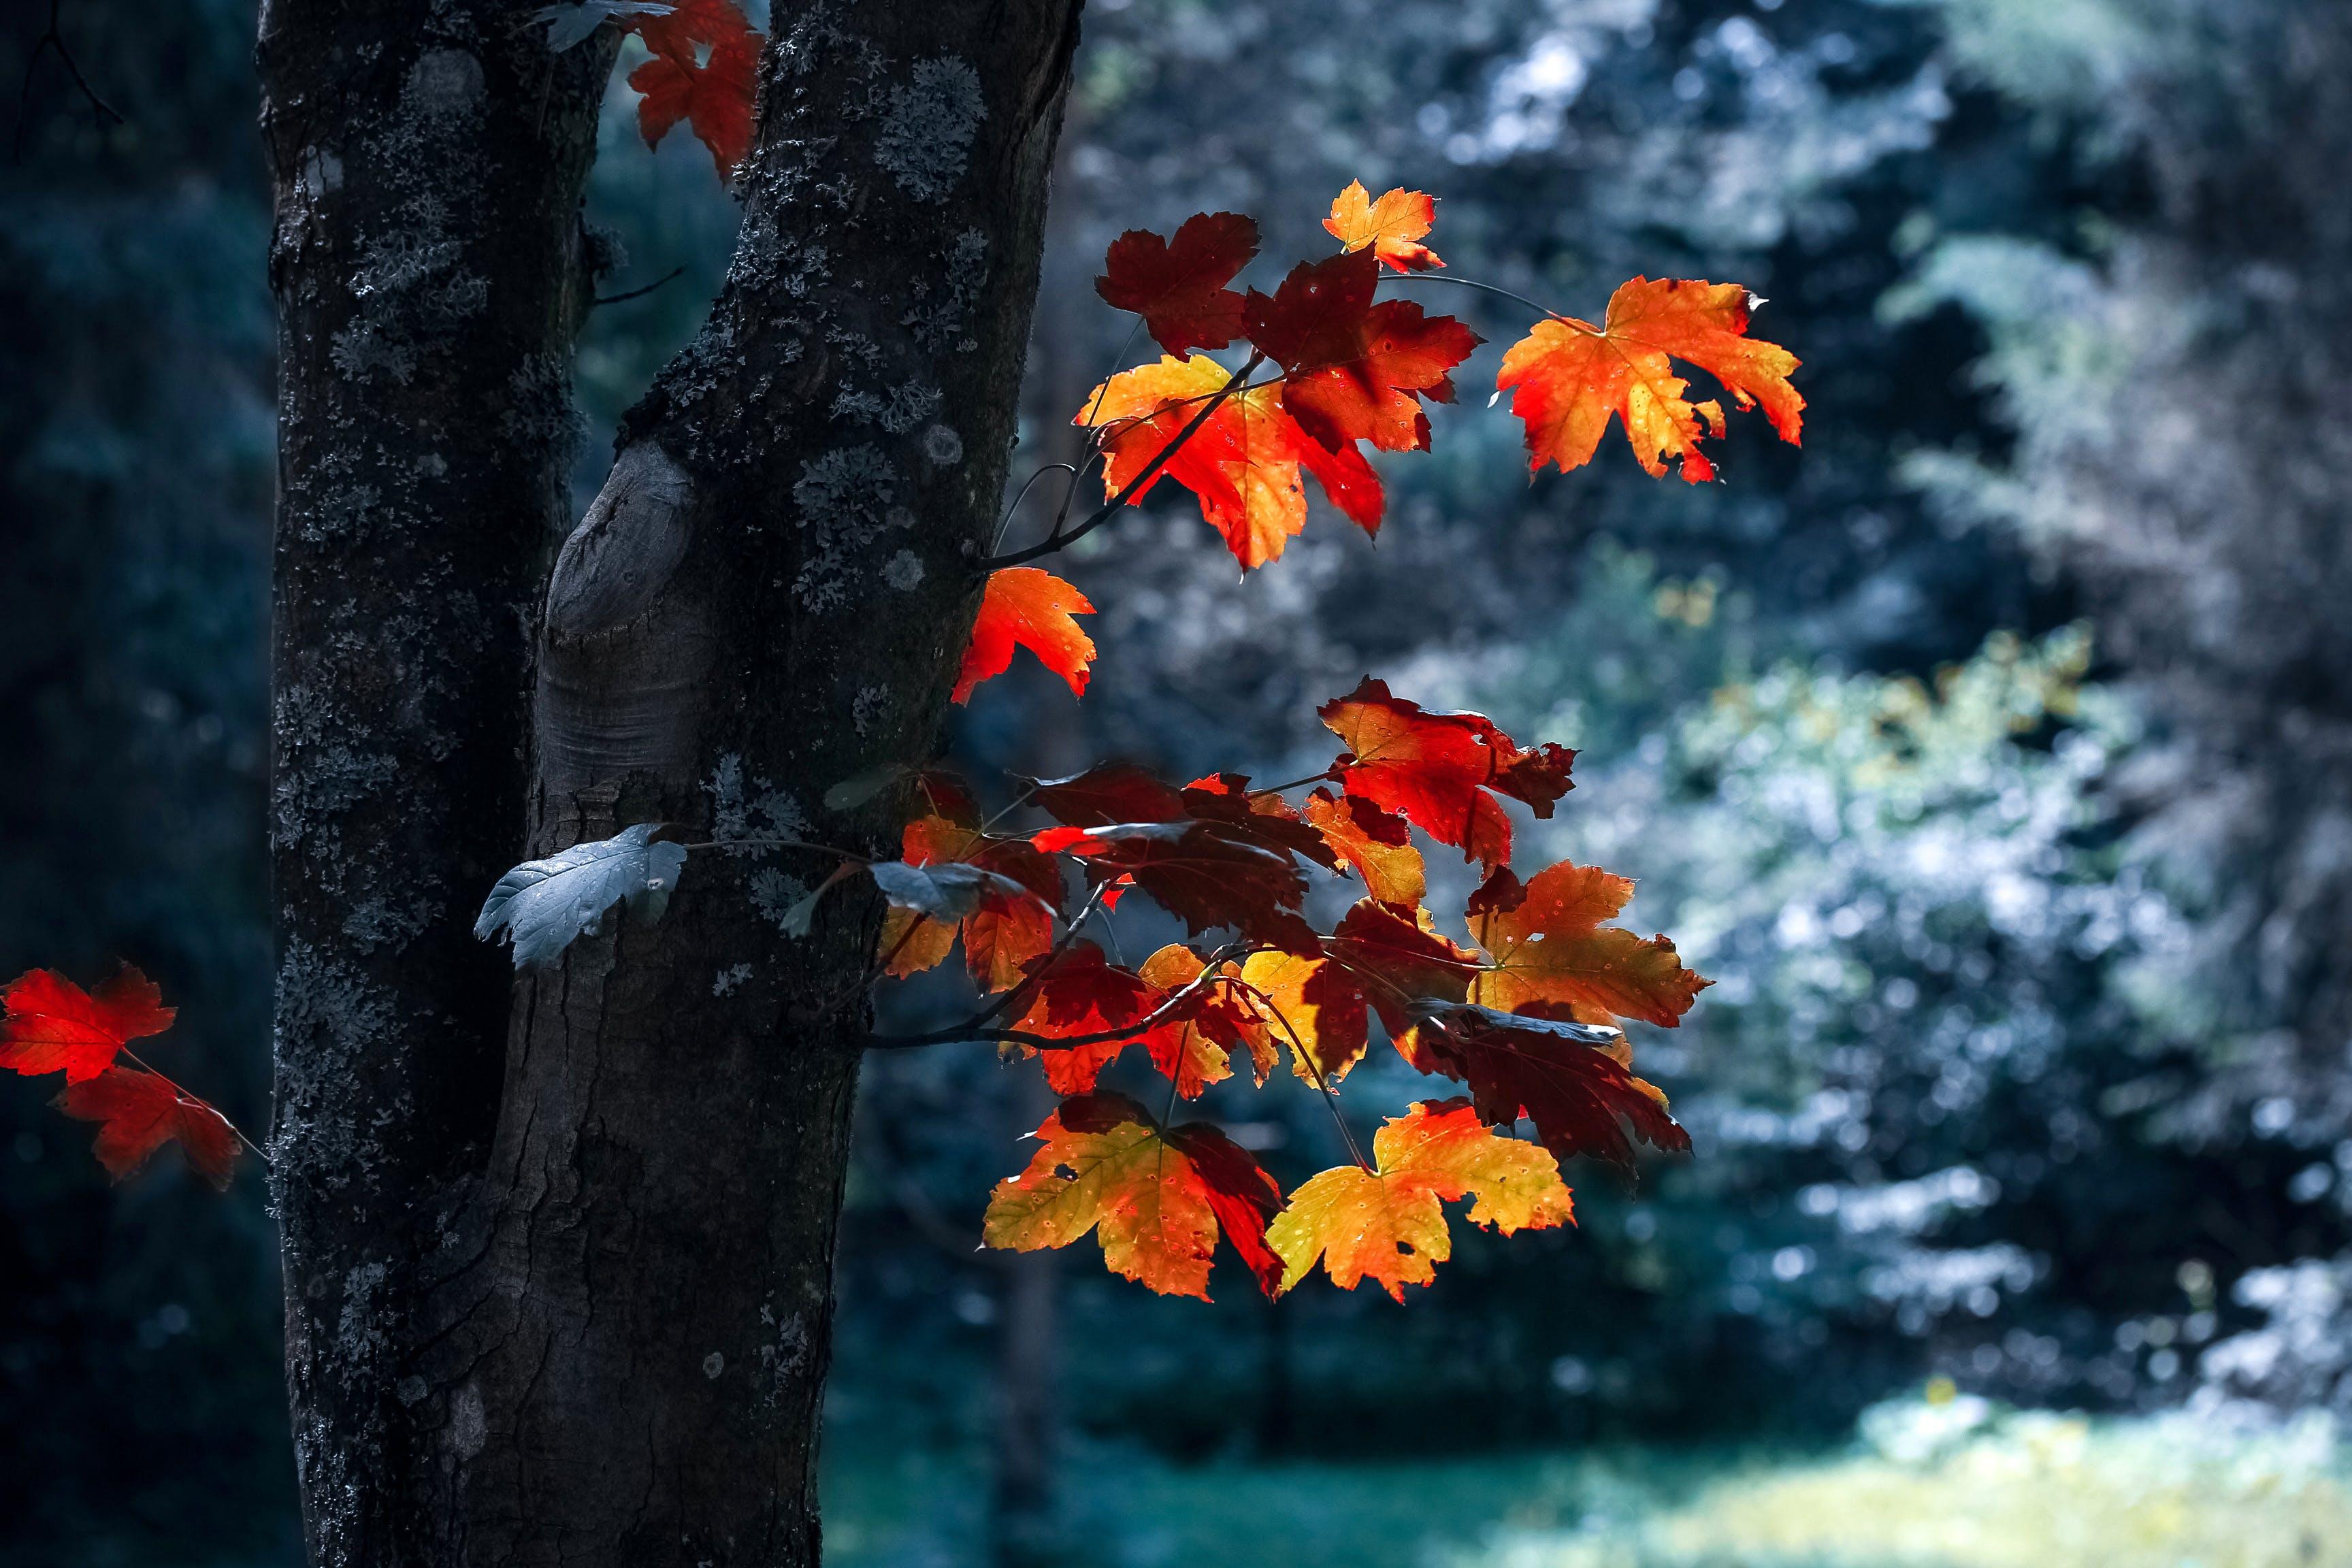 autumn, autumn leaves, blur